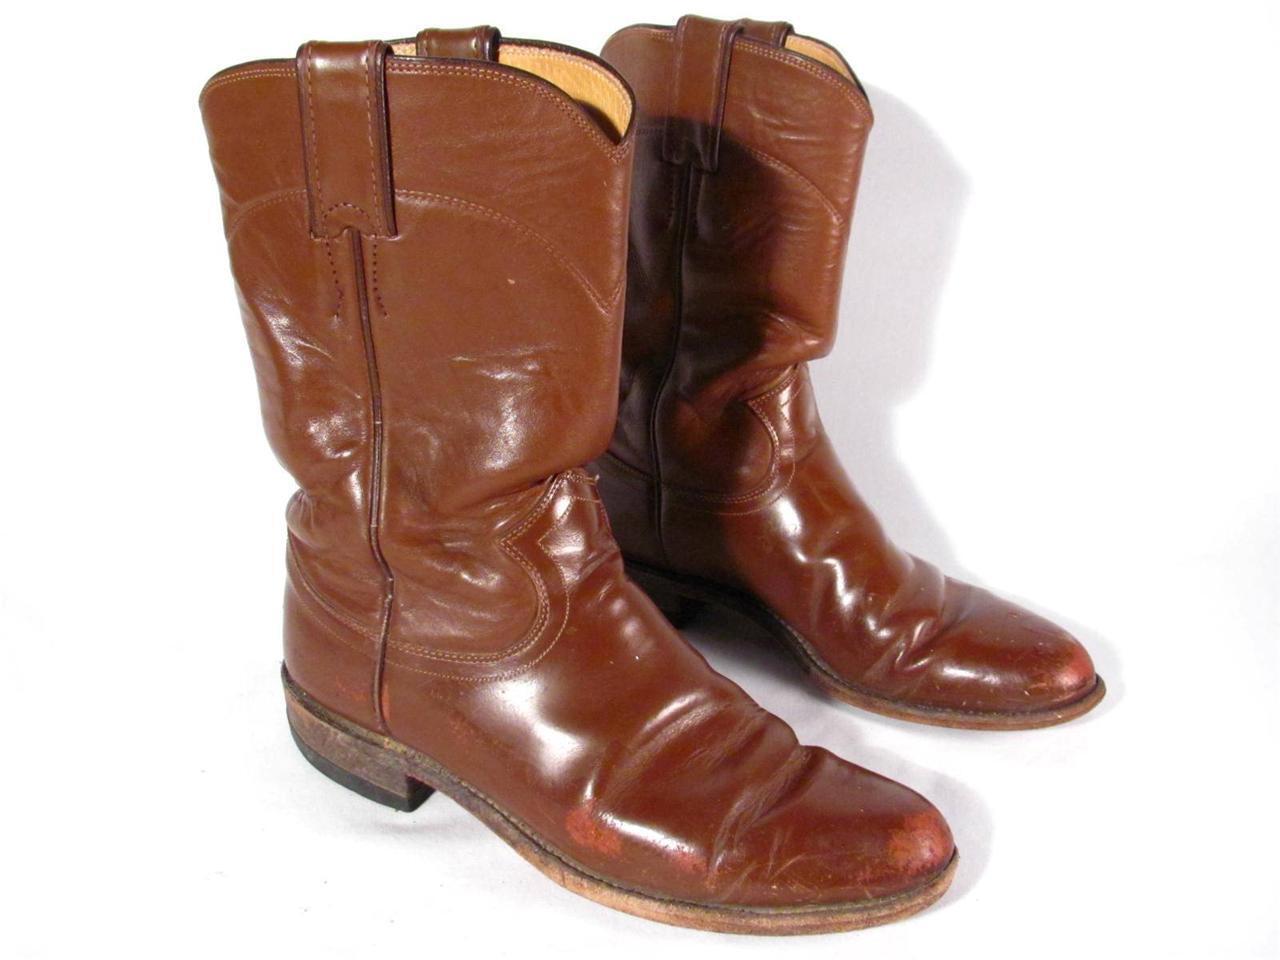 Vintage Justin Cowboy Boot Women size 6.5 M Tan leather